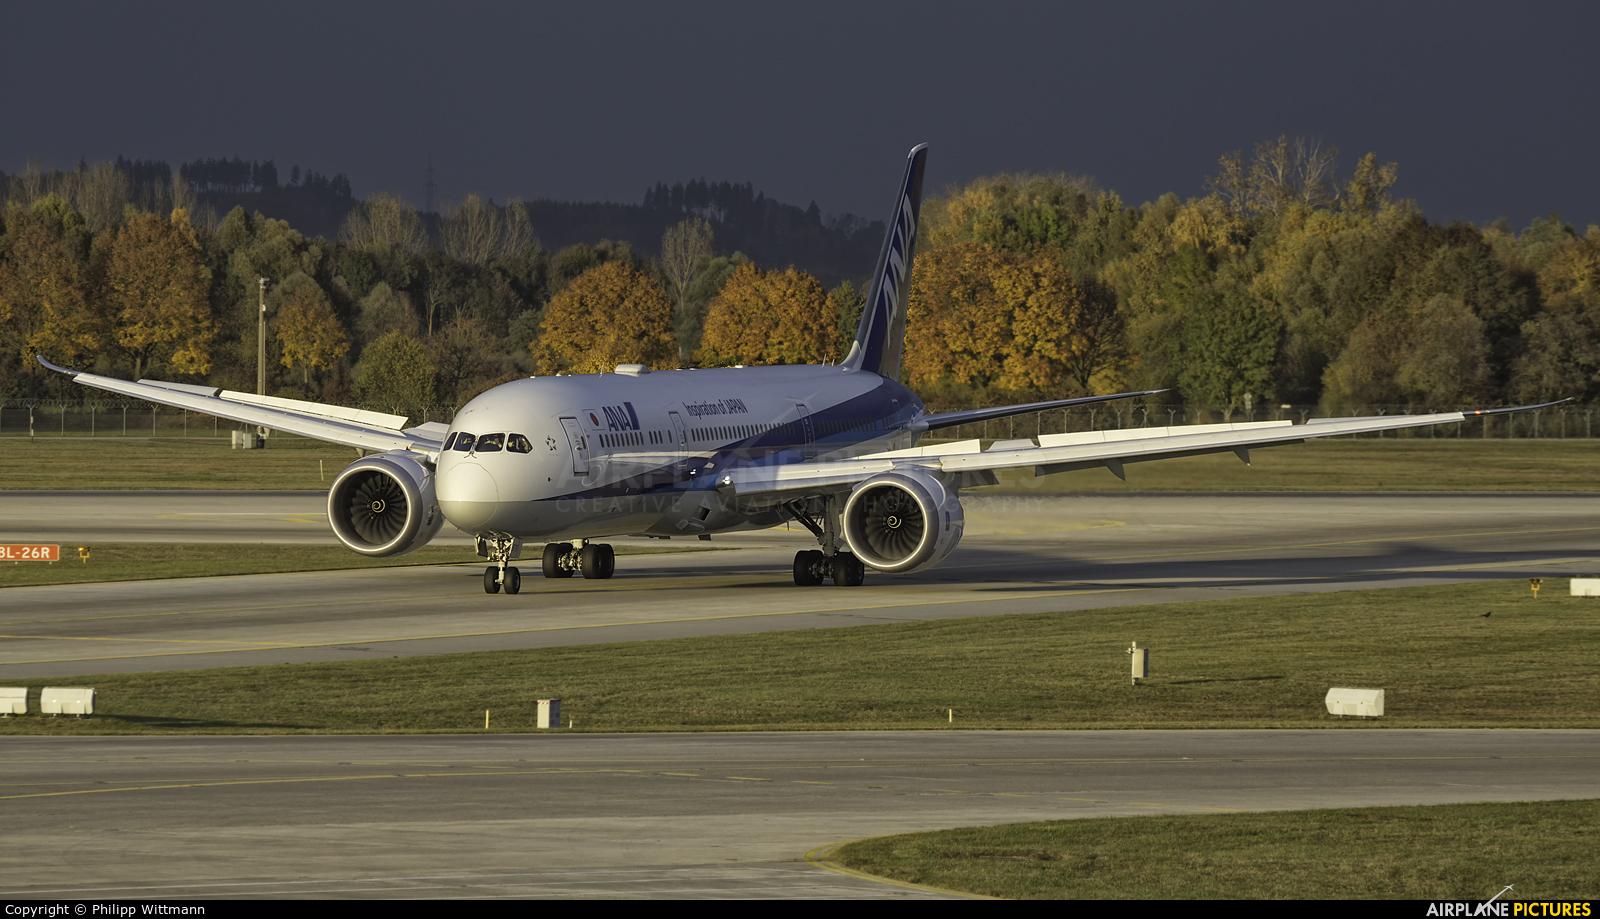 ANA - All Nippon Airways JA875A aircraft at Munich